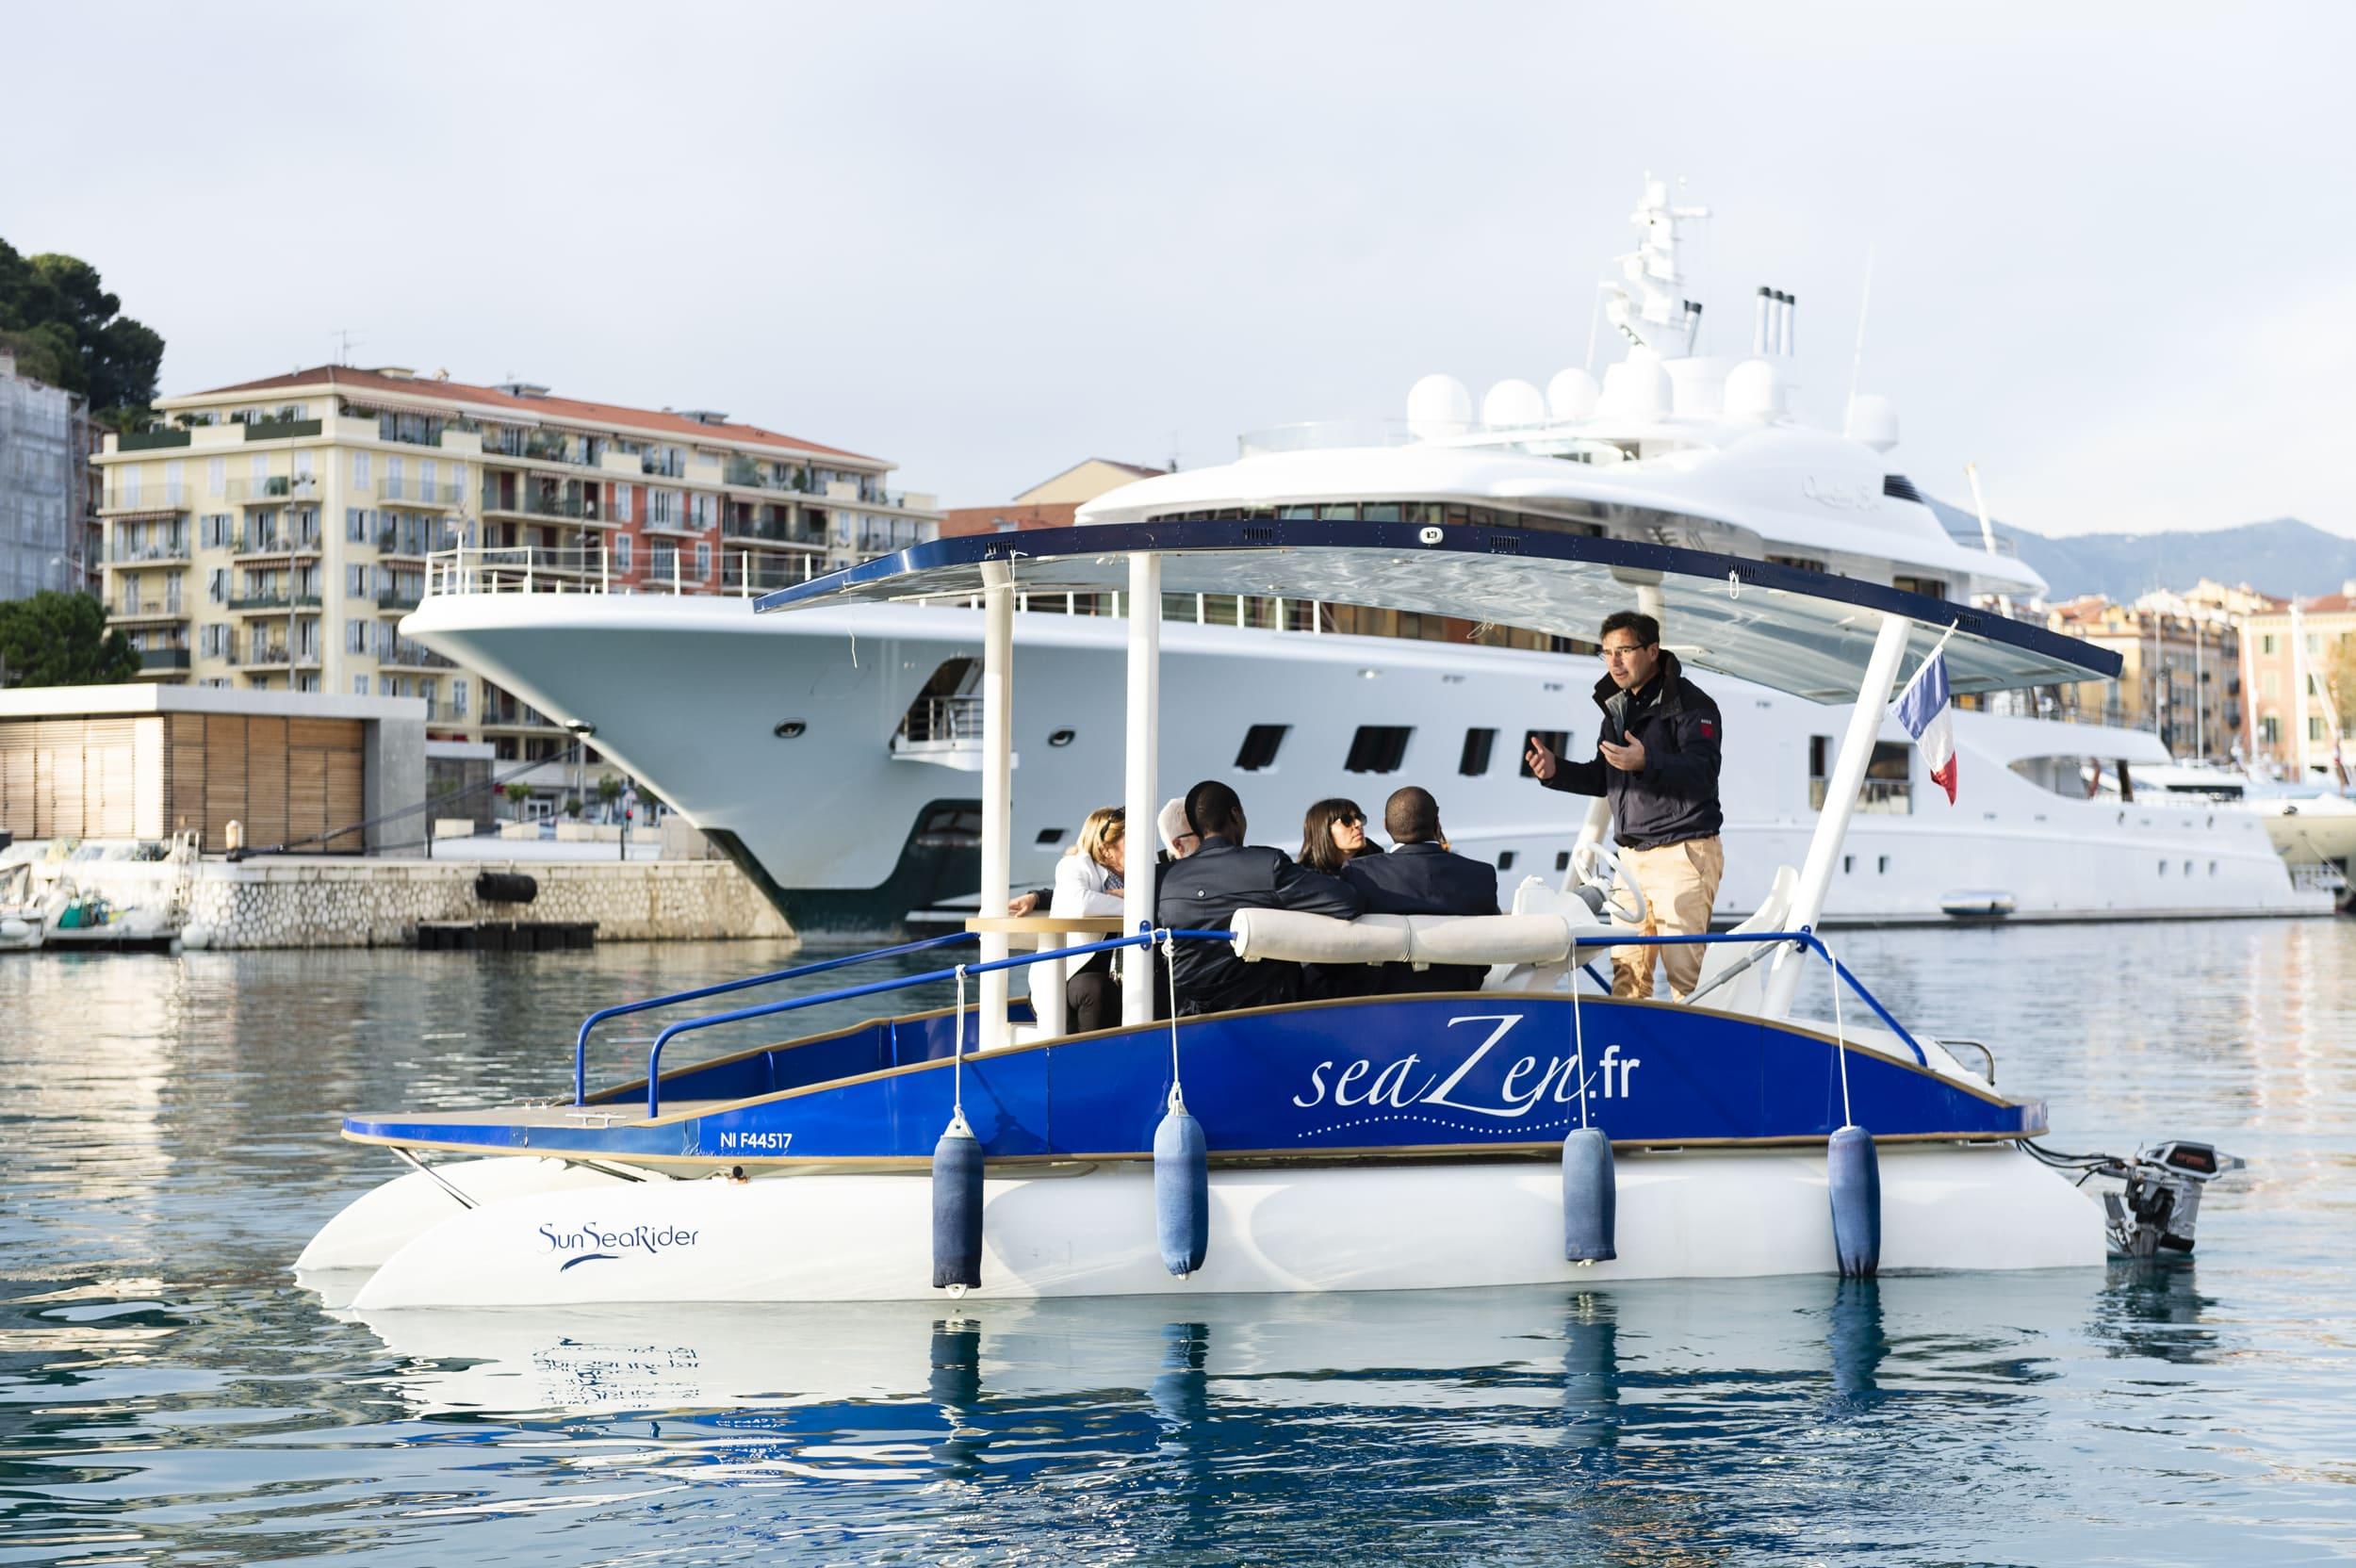 Promenade en bateau dans le port de Nice